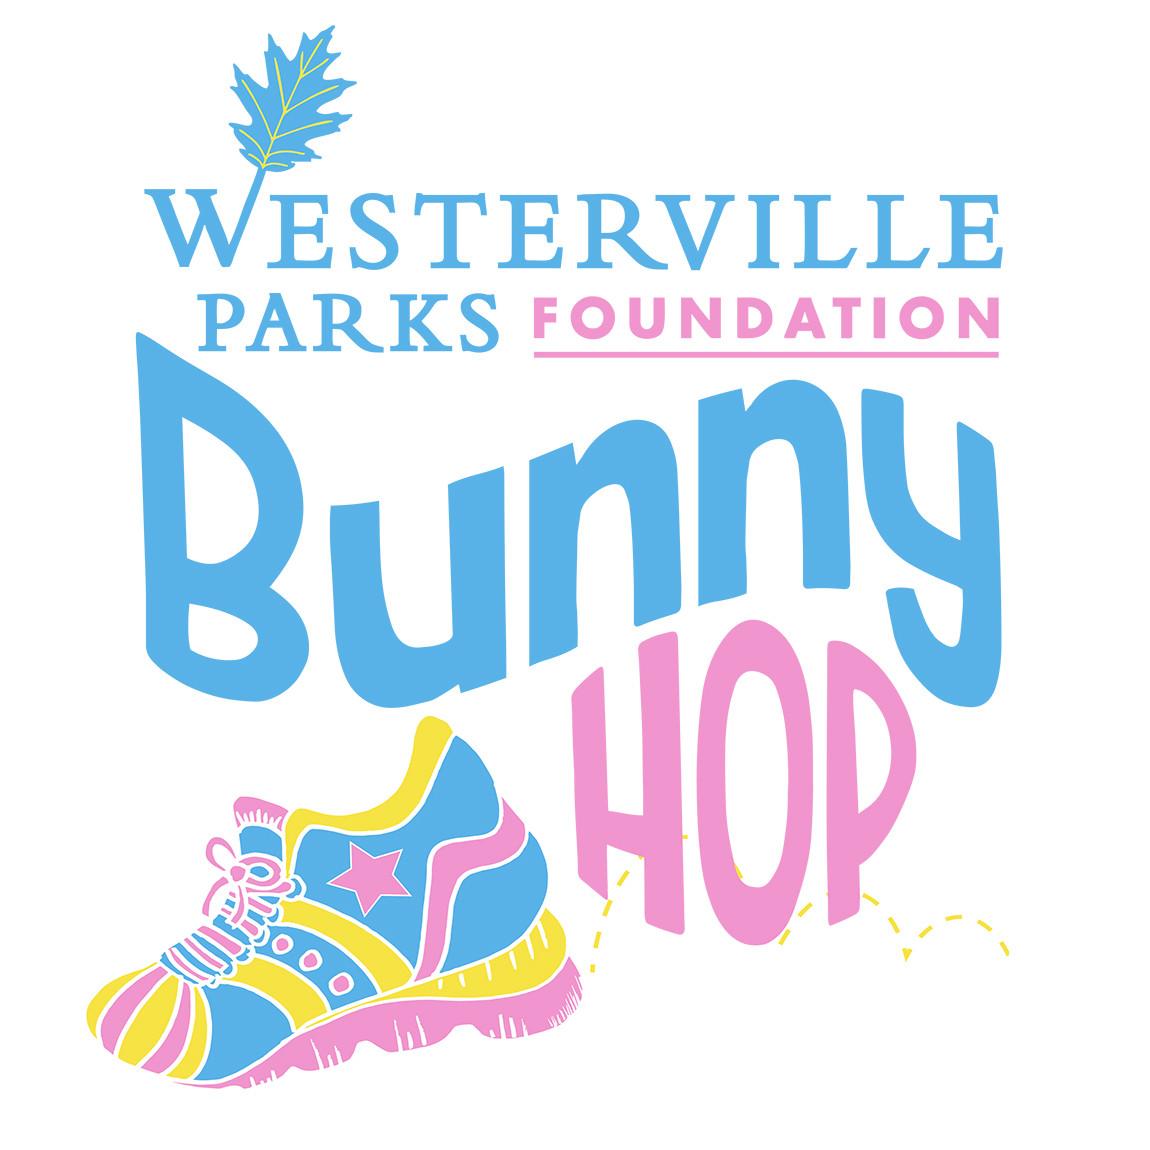 2019 Westerville Bunny Hop 5k Race Roster